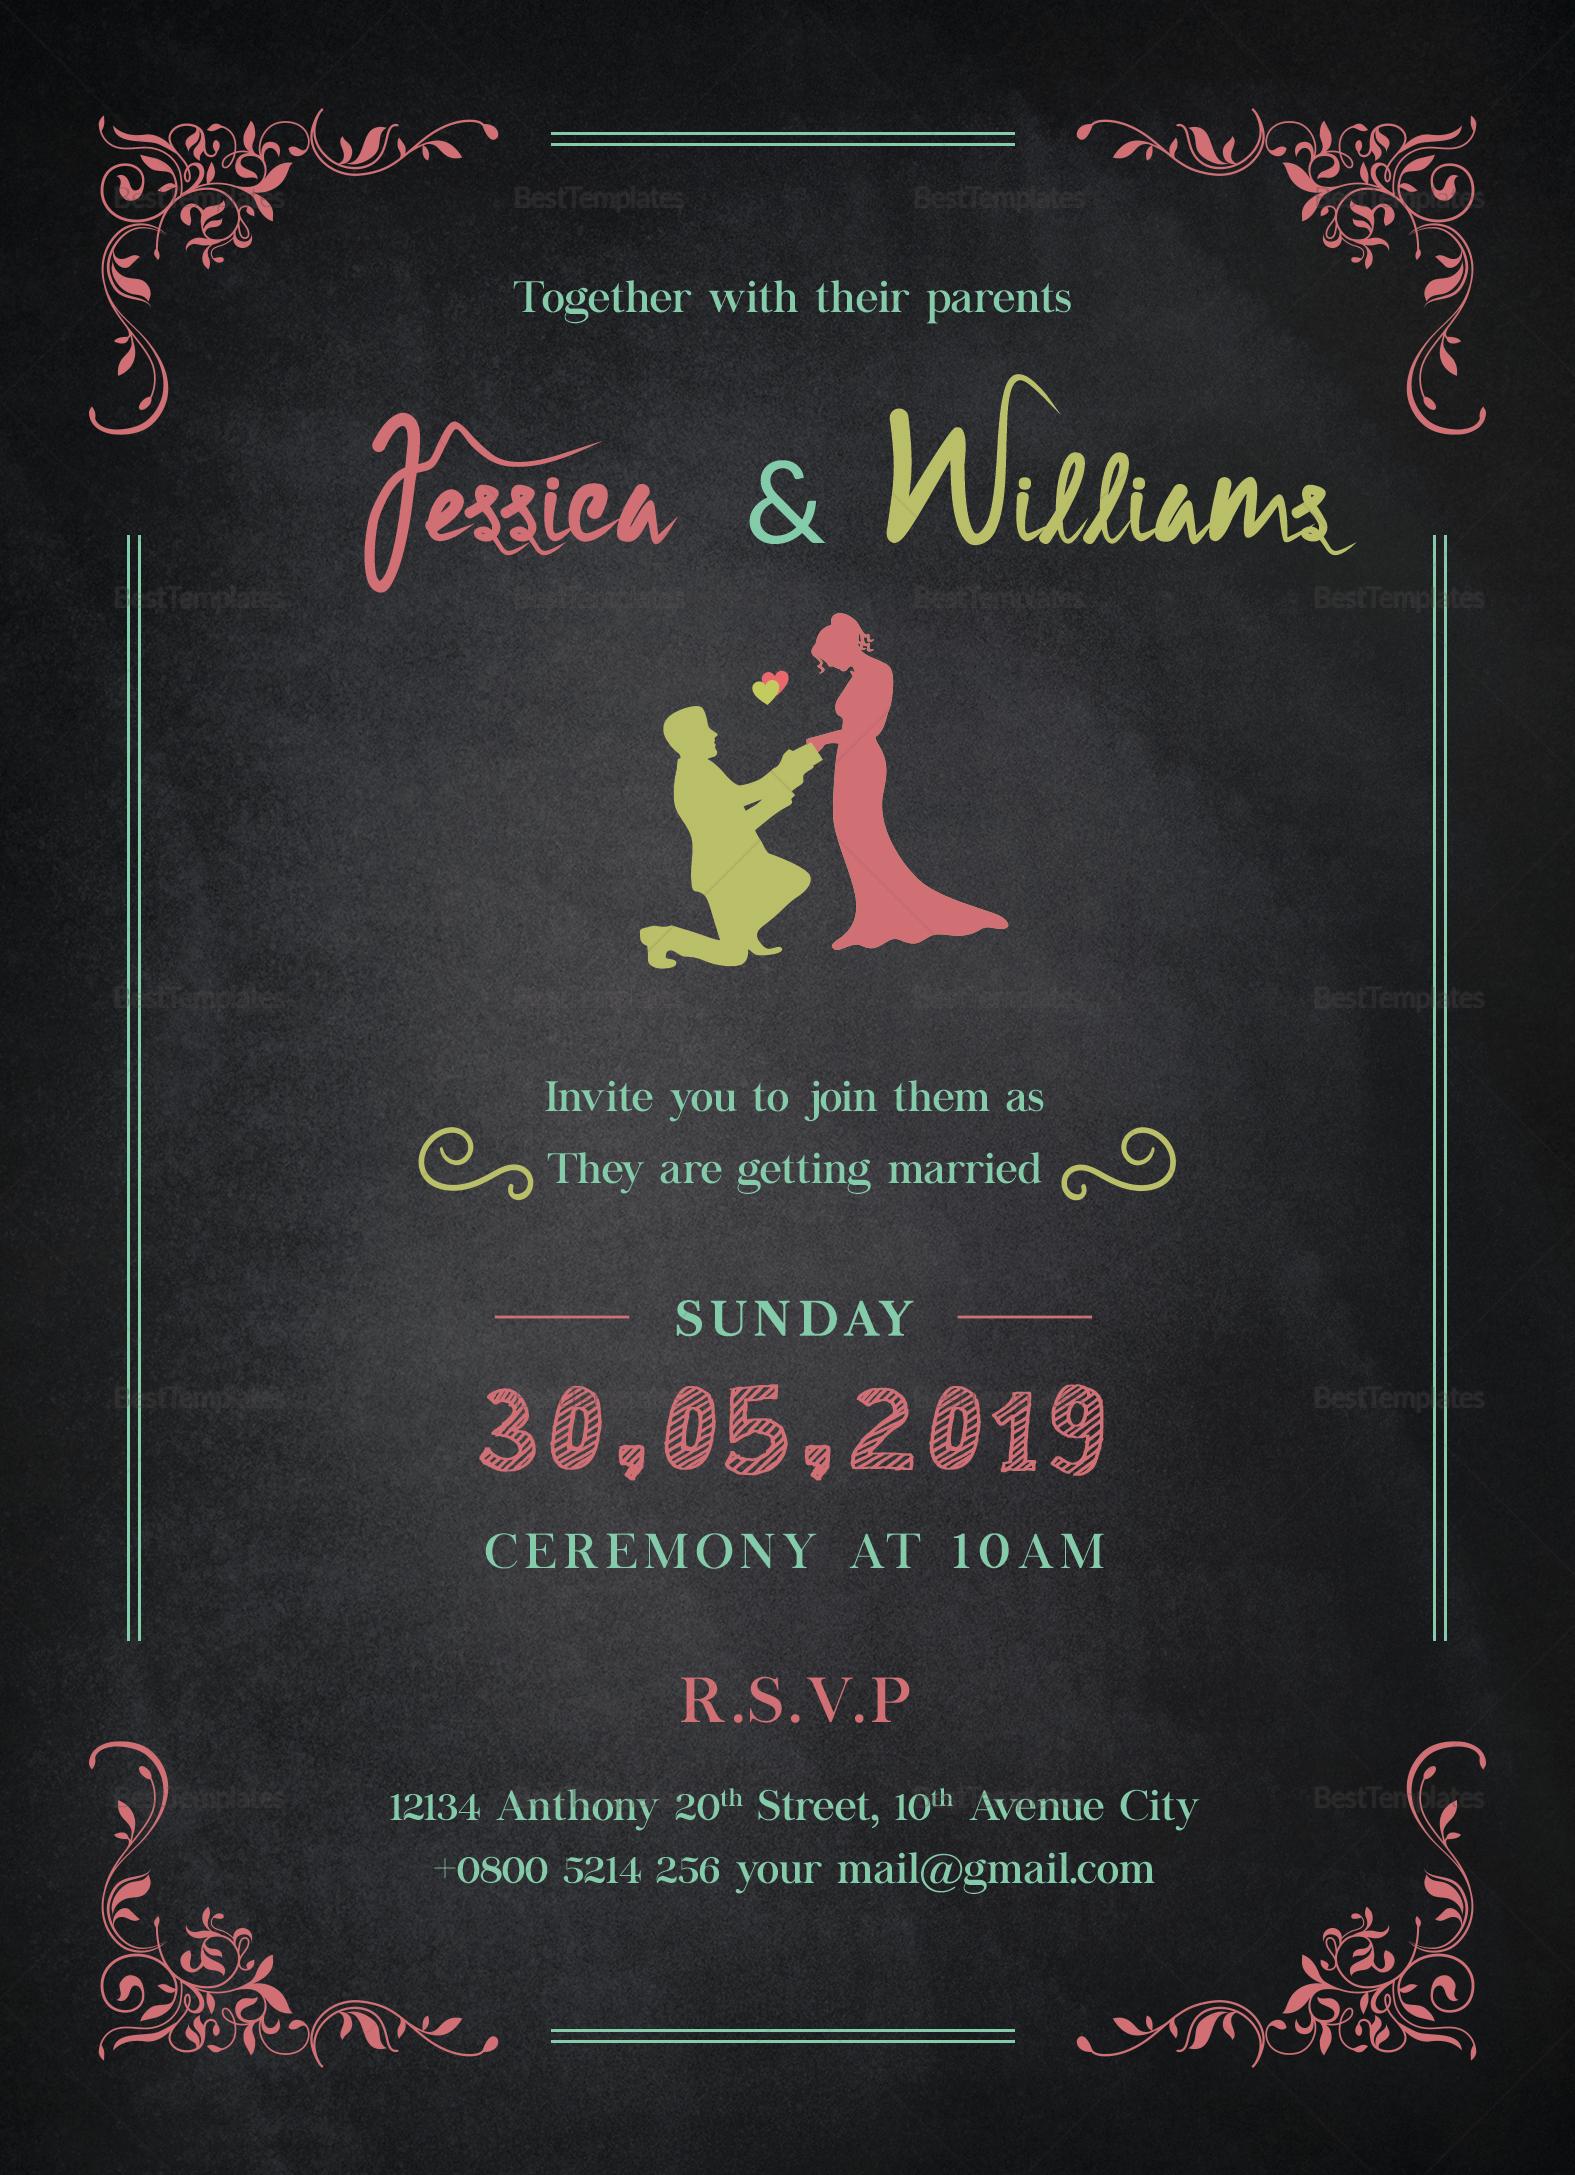 Chalkboard Wedding Invitation Design Template In Word PSD Publisher